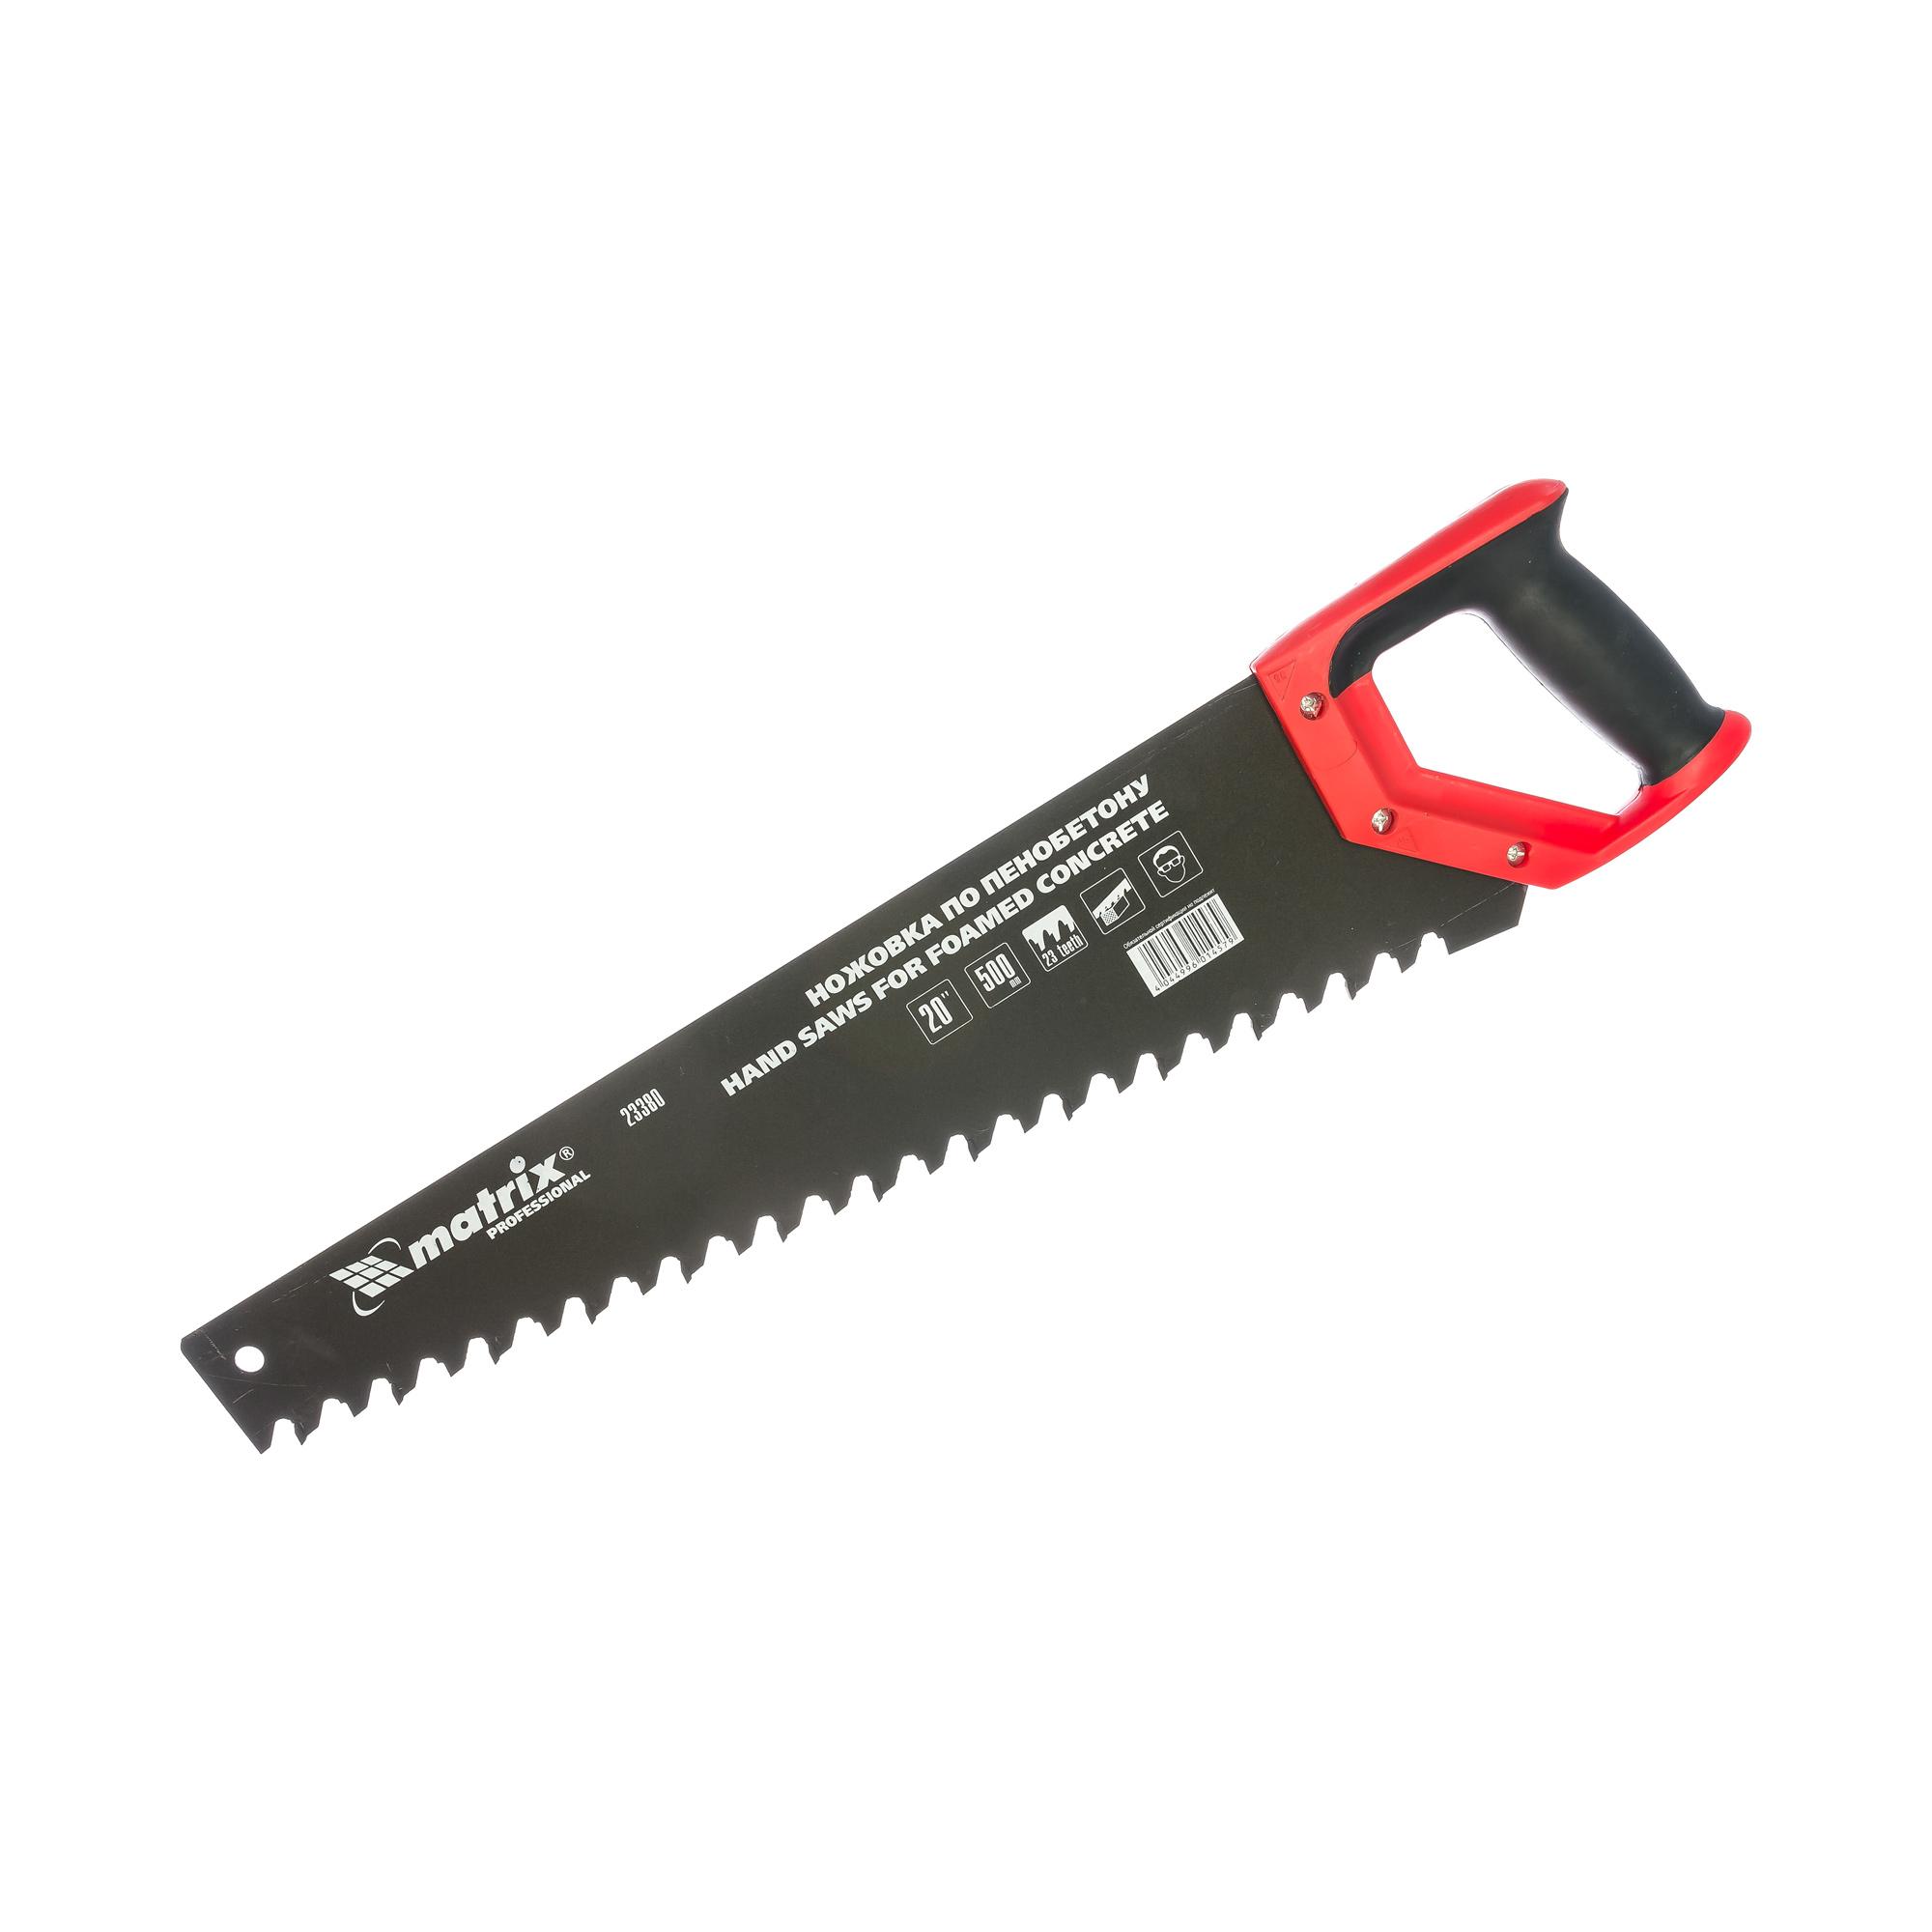 Ножовка Matrix по пенобетону 500 мм